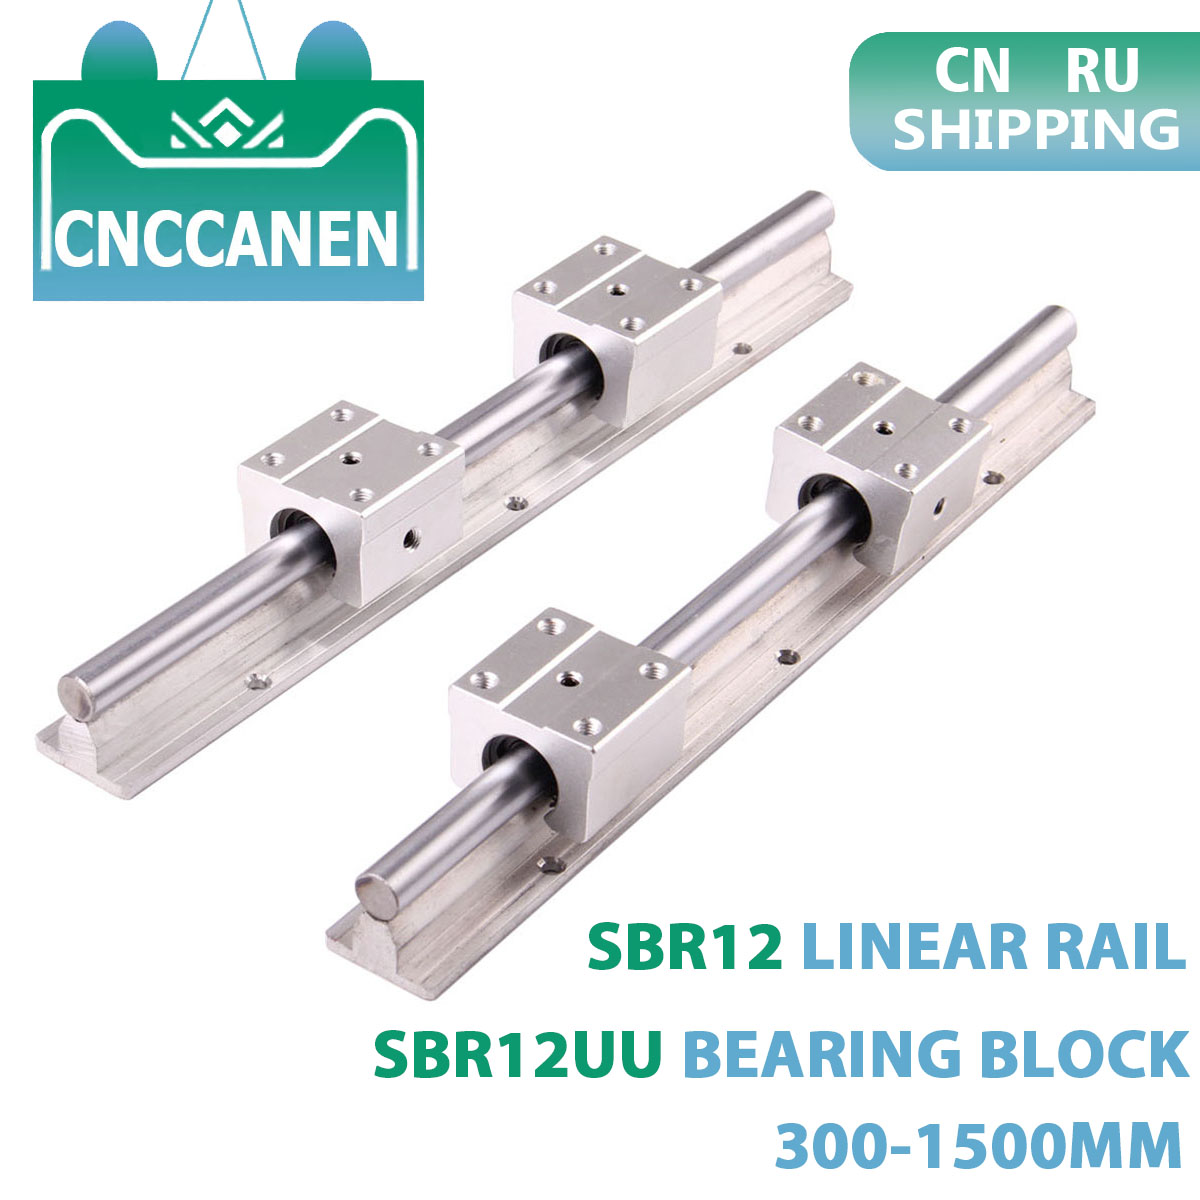 2PCS SBR12 12mm Linear Guide Rail Length 300 400 500 600 1000mm 1200 1300 1500mm With 4PCS SBR12UU Linear Bearing Block CNC Part